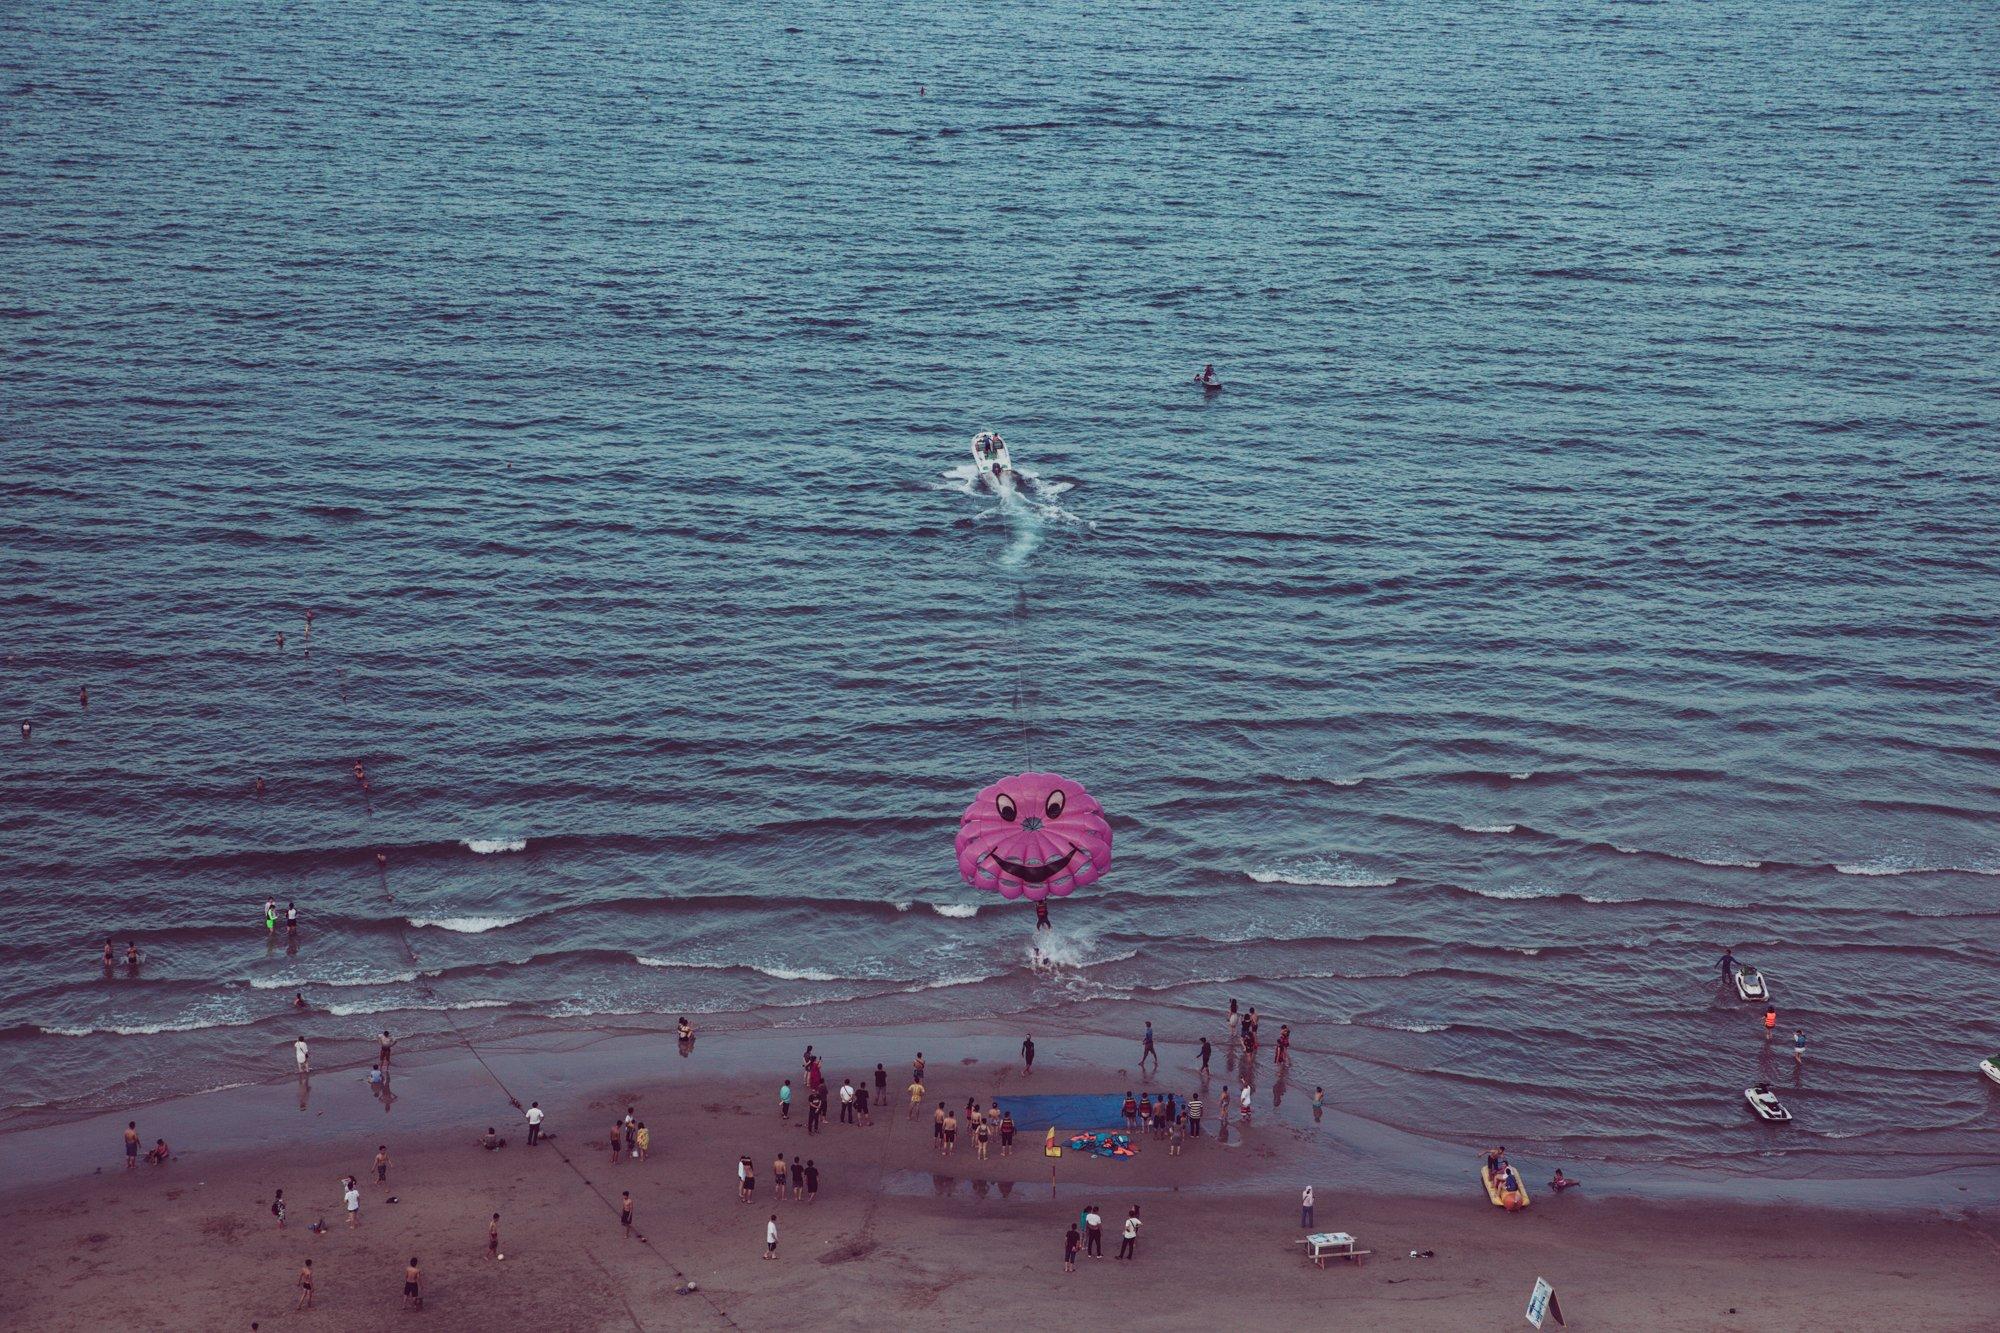 parasailing at my khe beach in da nang vietnam